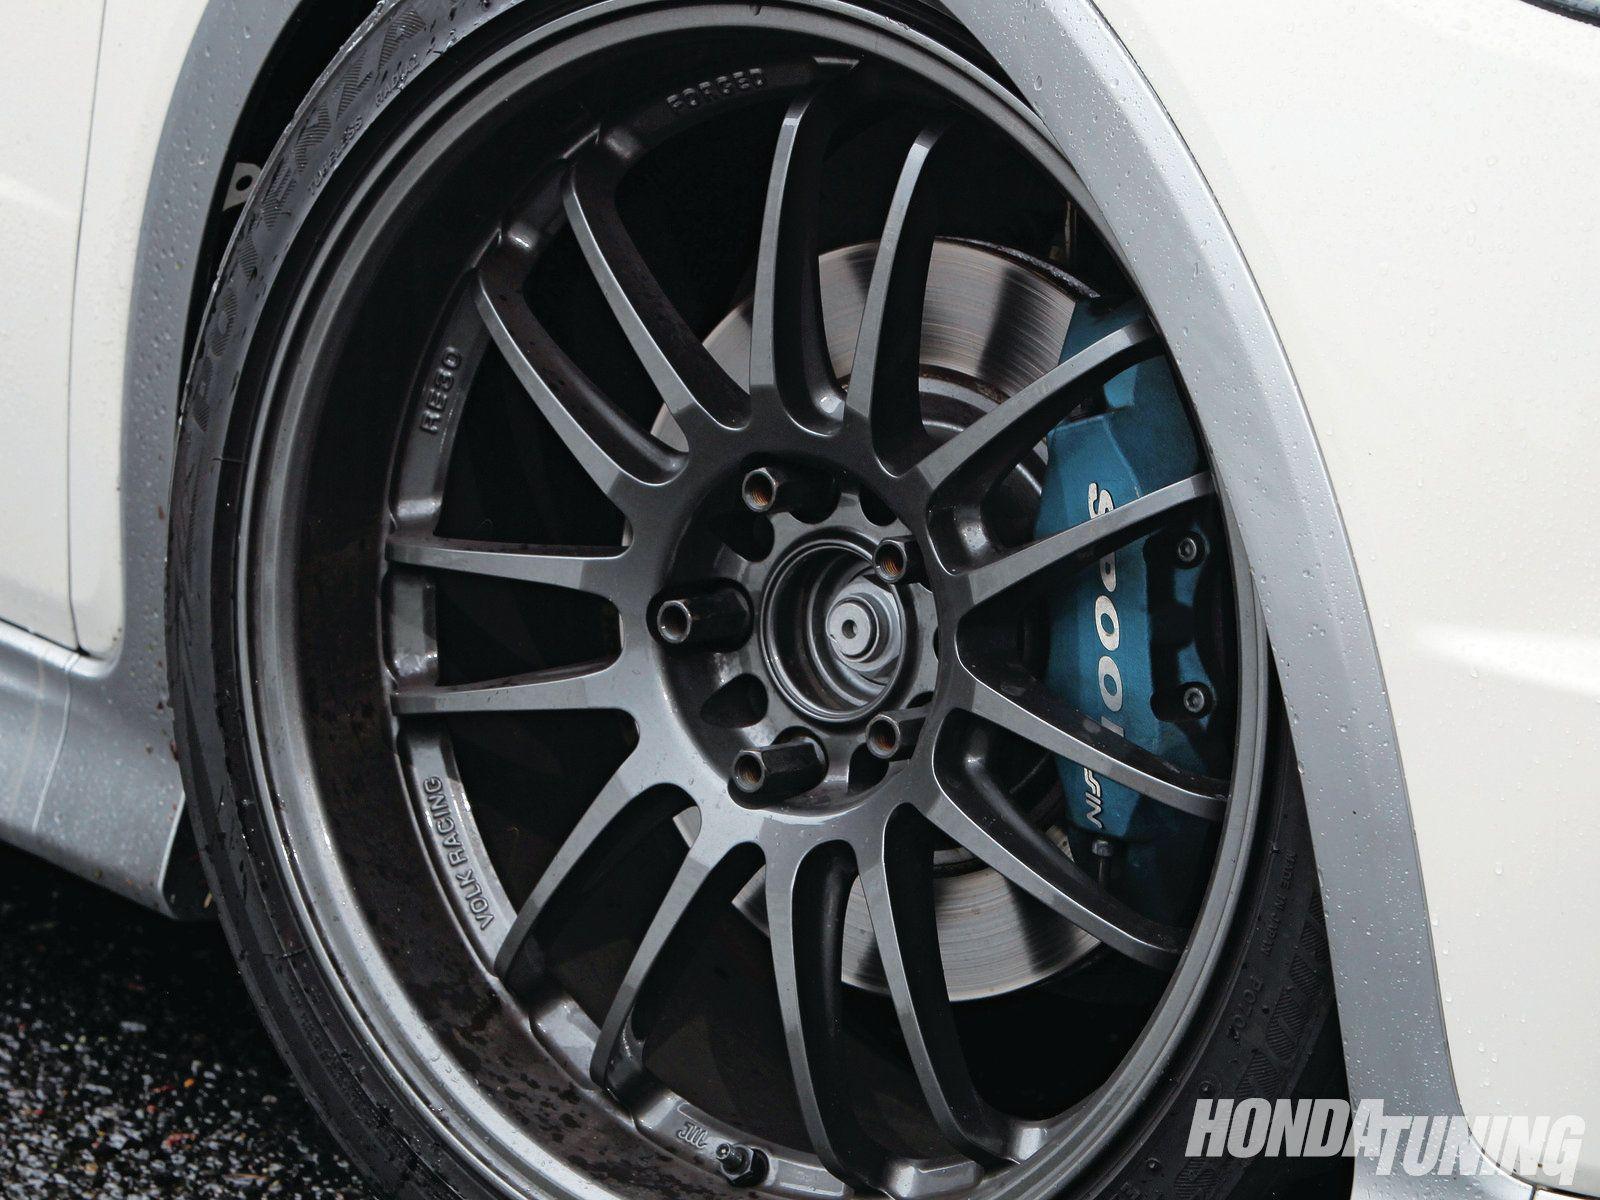 Type R Font Honda Civic Fn2 Type R Silver Wheel Valve Caps